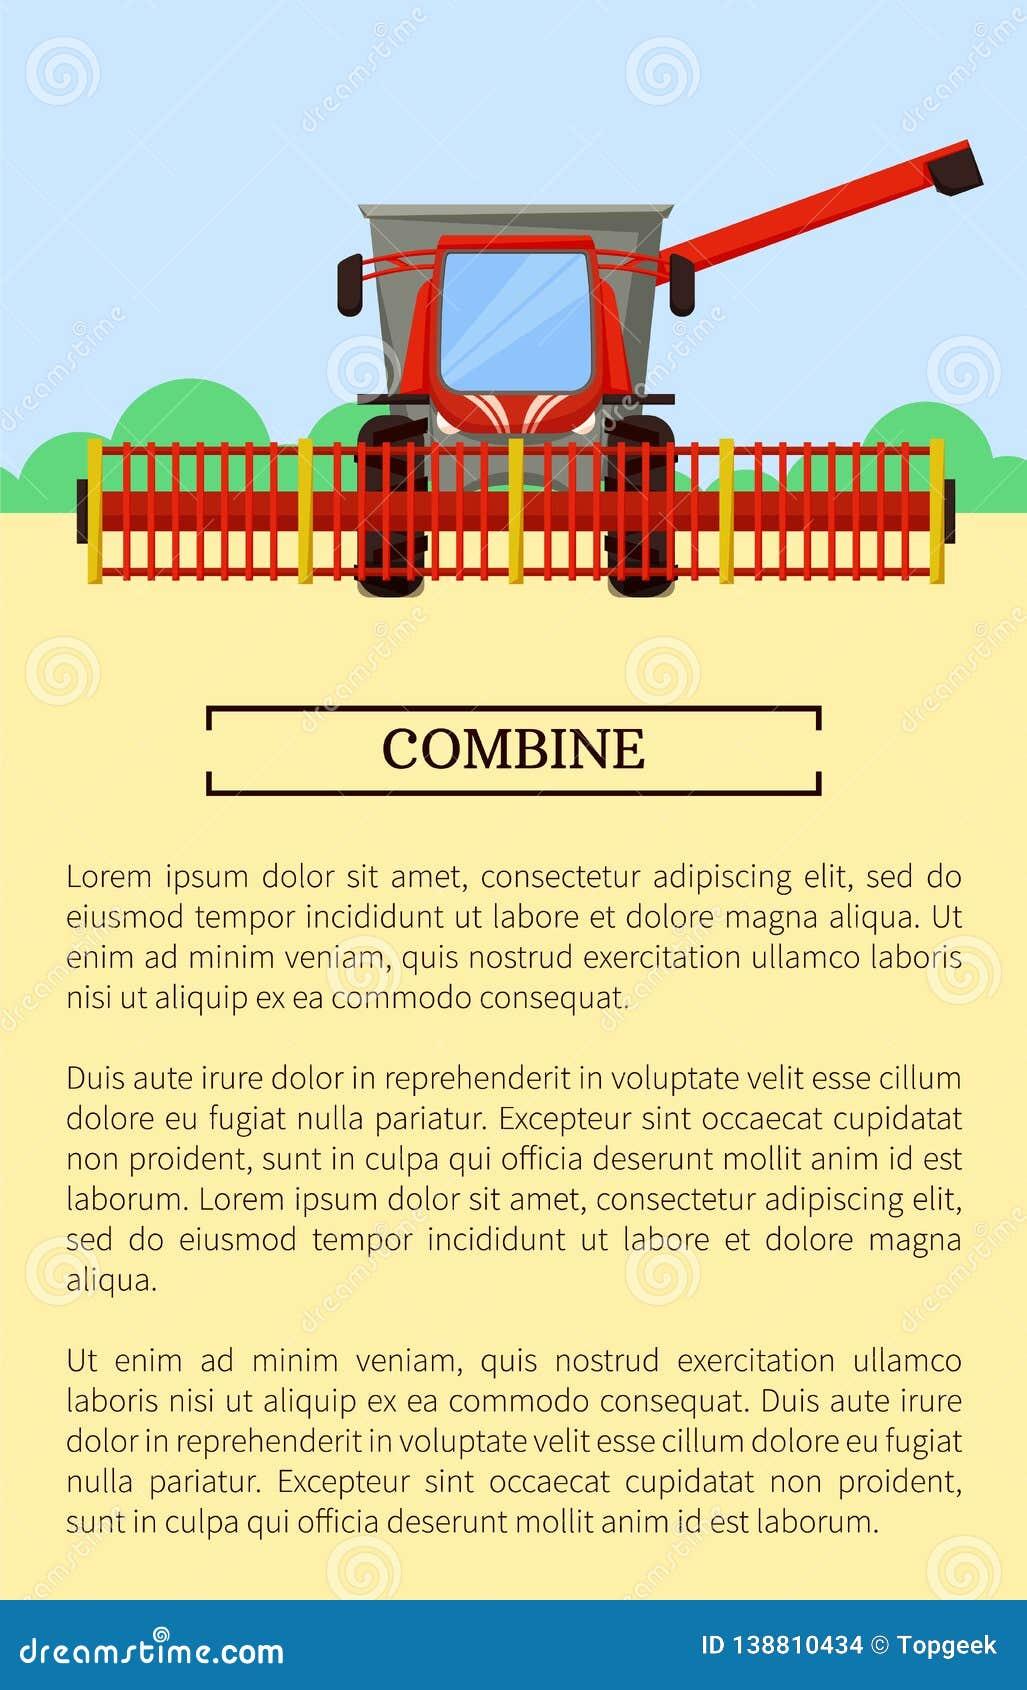 Combine Machine Field Poster Vector Illustration